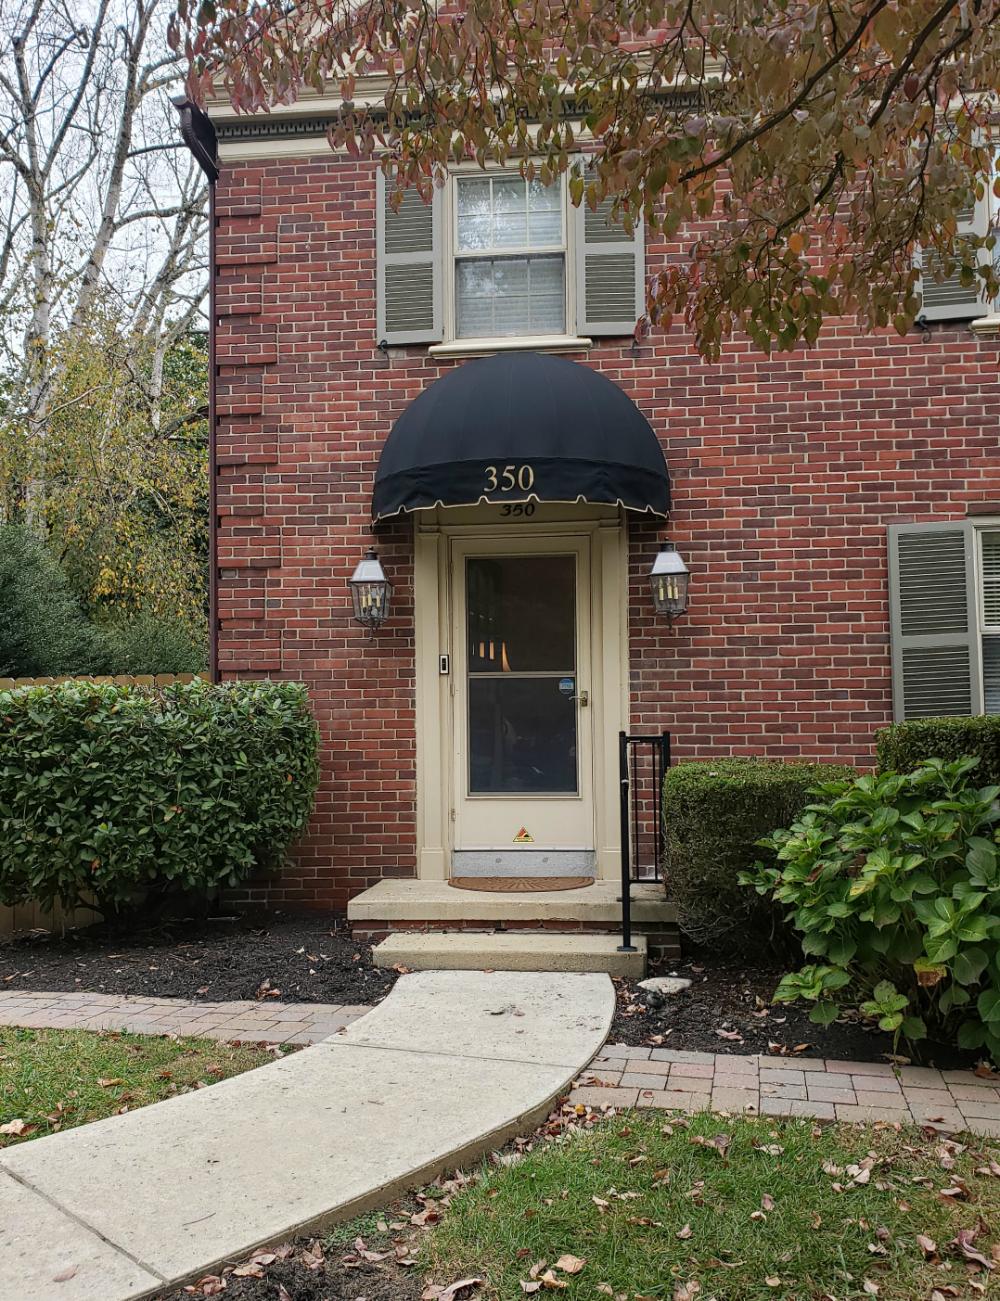 Bullnose Style Doorhood Awning Residential Kreider S Canvas Service Inc Awning Over Door Outdoor Window Awnings Door Overhang